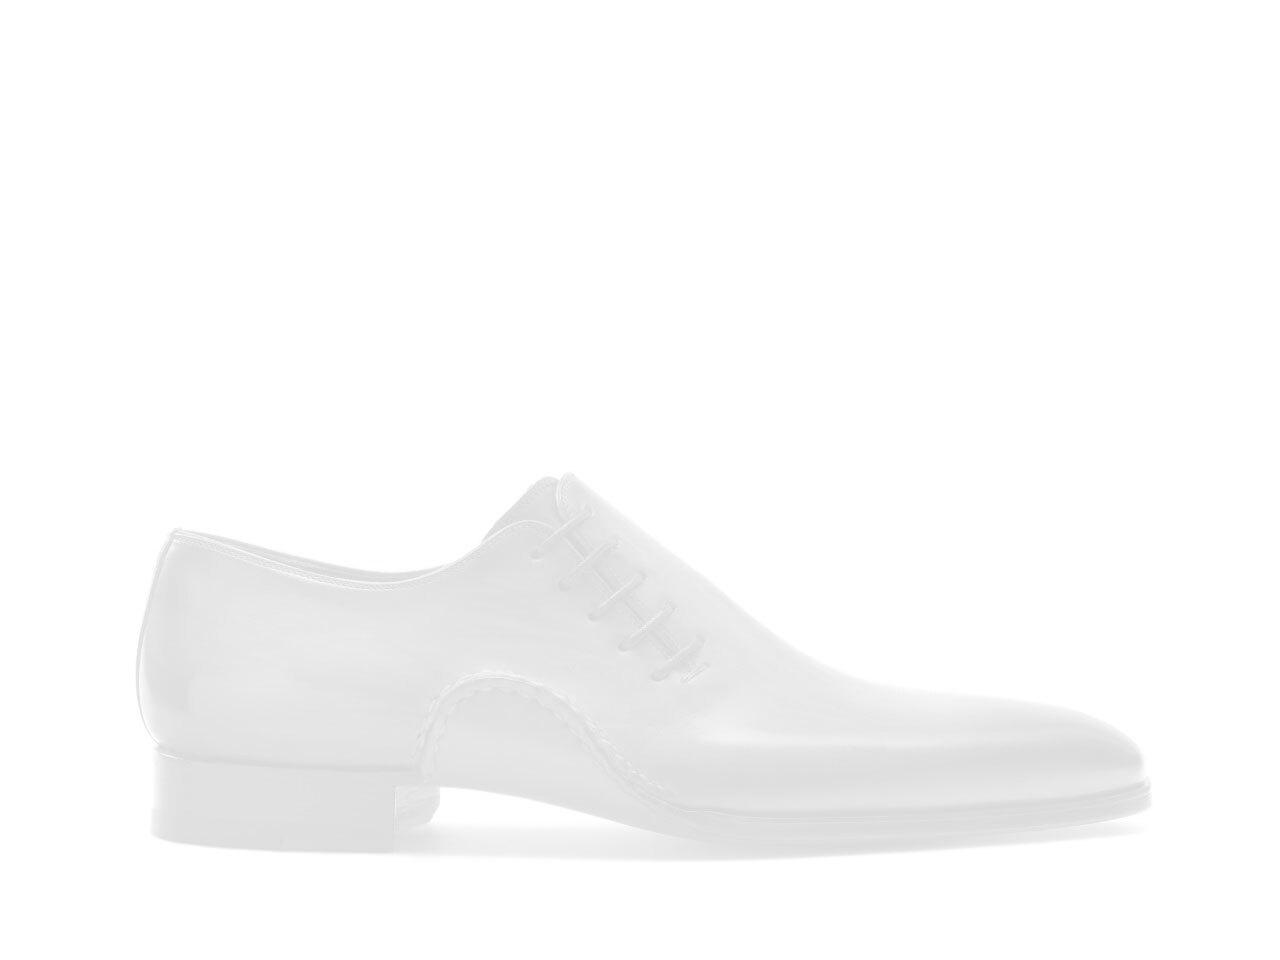 Sole of the Magnanni Nalón Black Men's Double Monk Strap Shoes